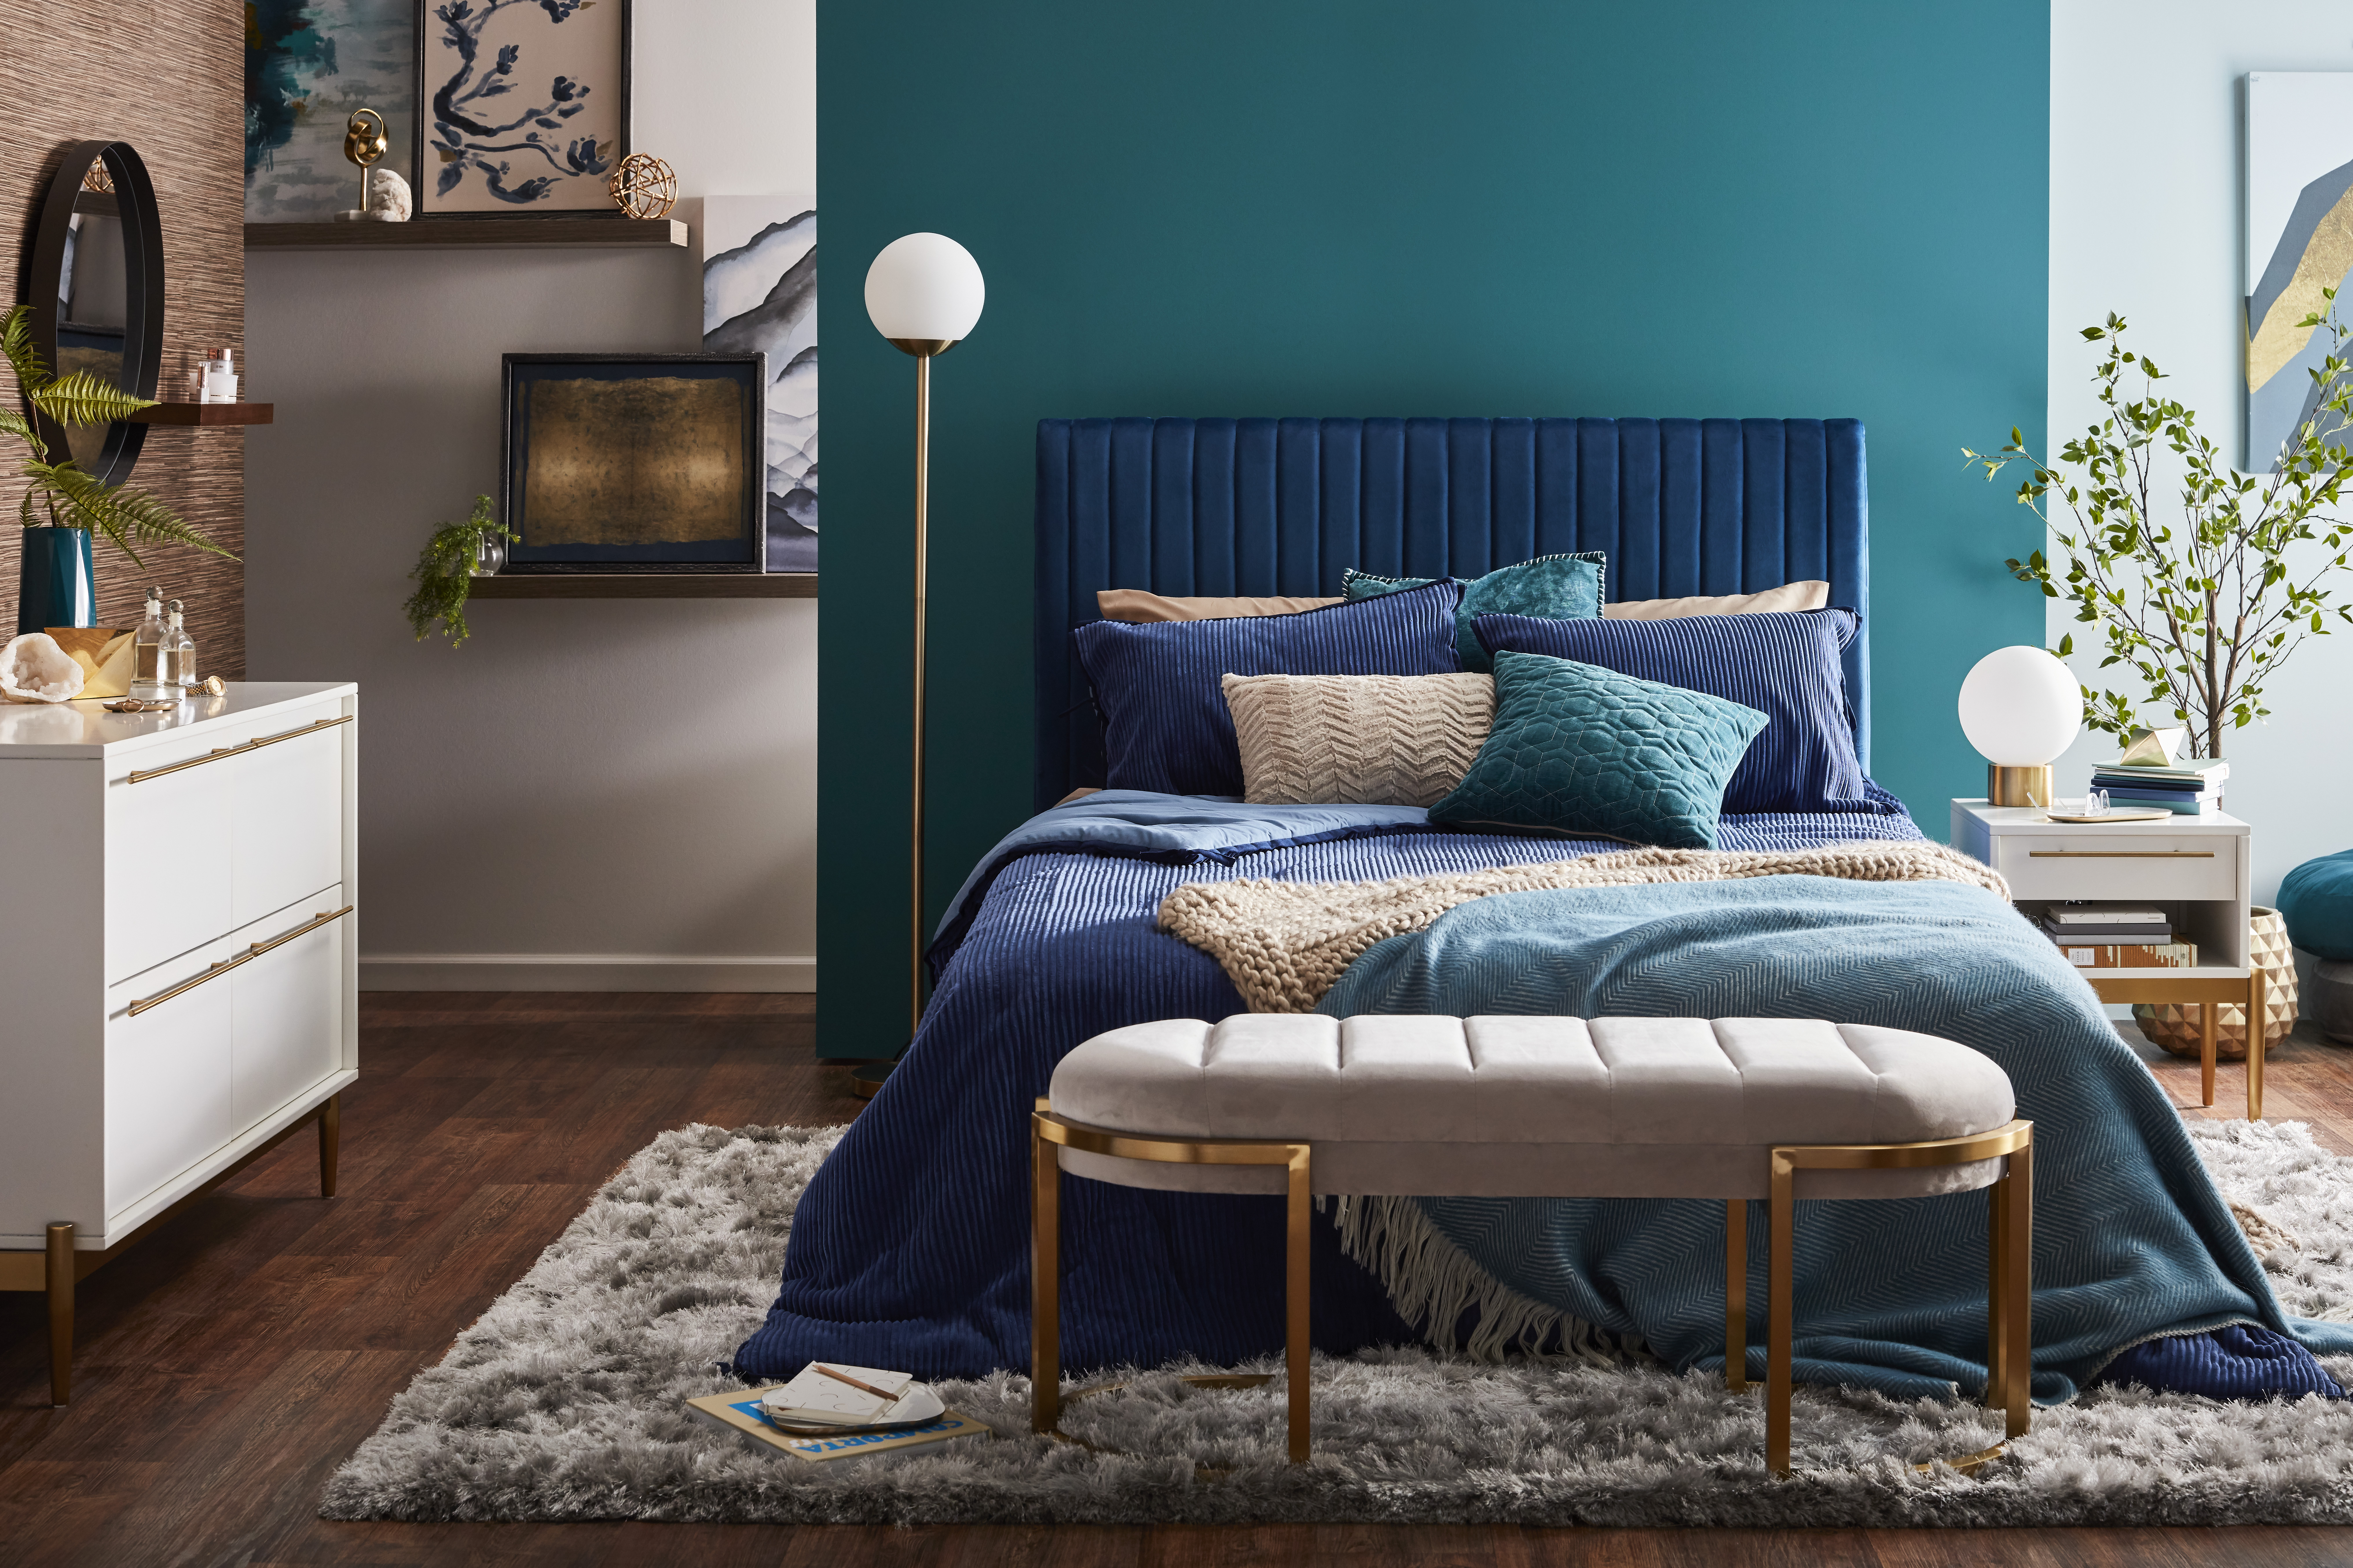 Modrn serene luxury bedroom Instagram Post